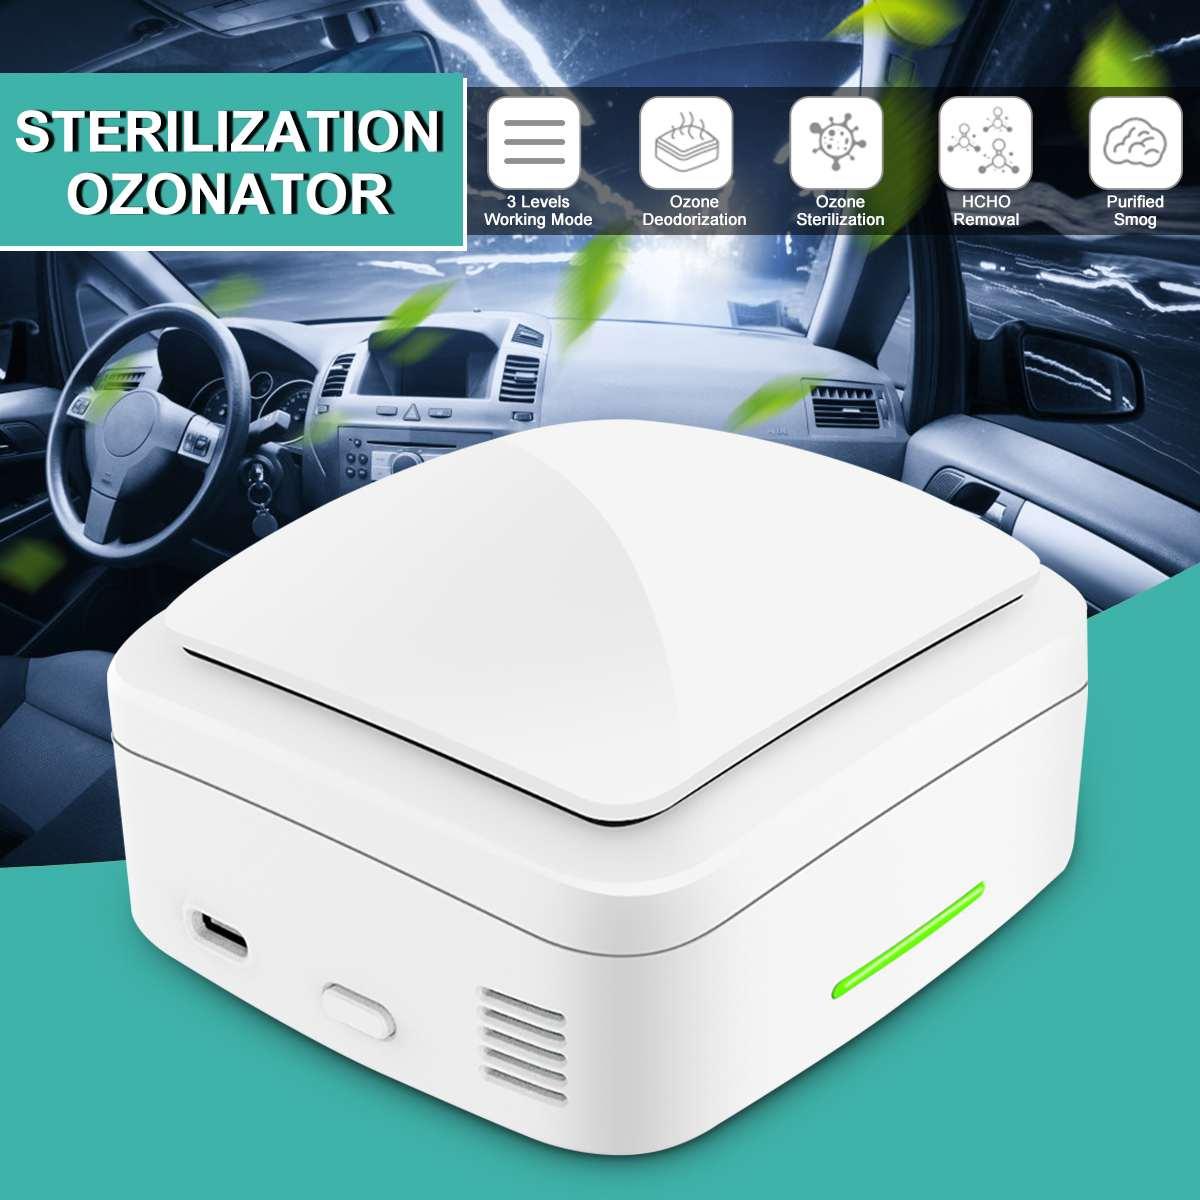 Air-Purifier Car Ozone Sterilizer Generator Ionizer Generator FILTER Purification Home Deodorizer Pet Deodorizer Air Ionizer